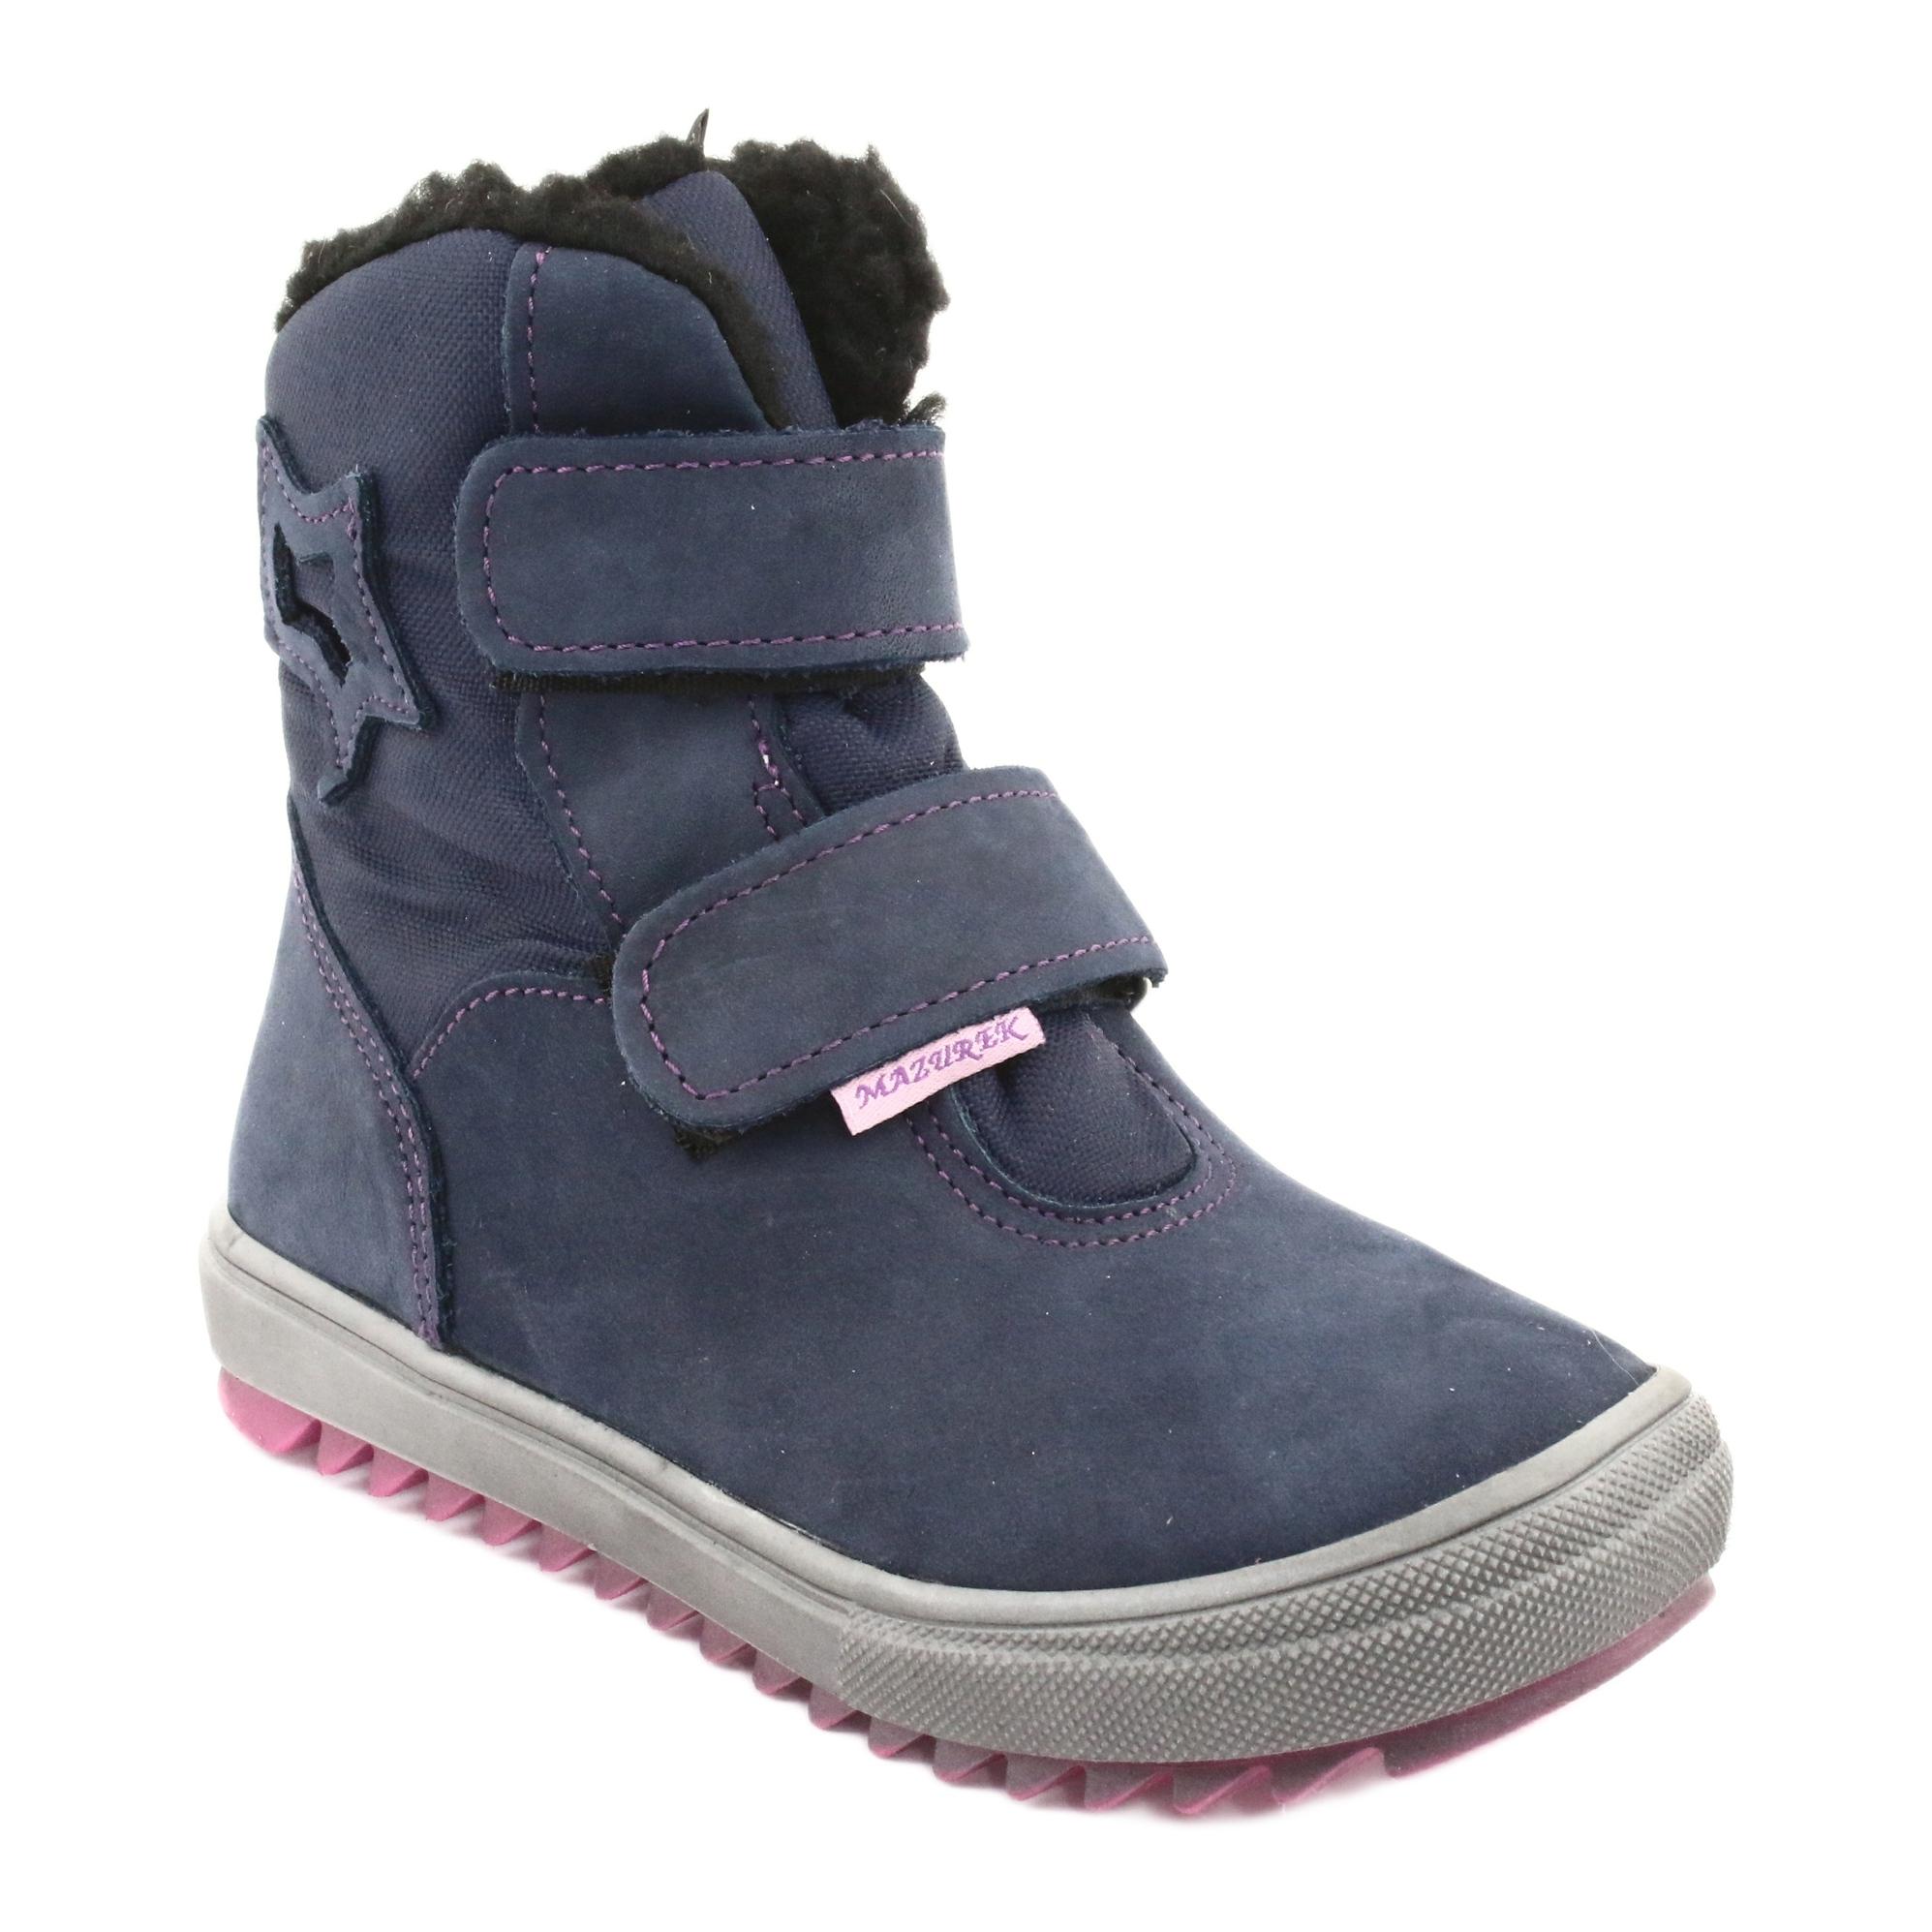 miniatura 2 - Stivali con una membrana Mazurek 1353 blu scuro marina rosa